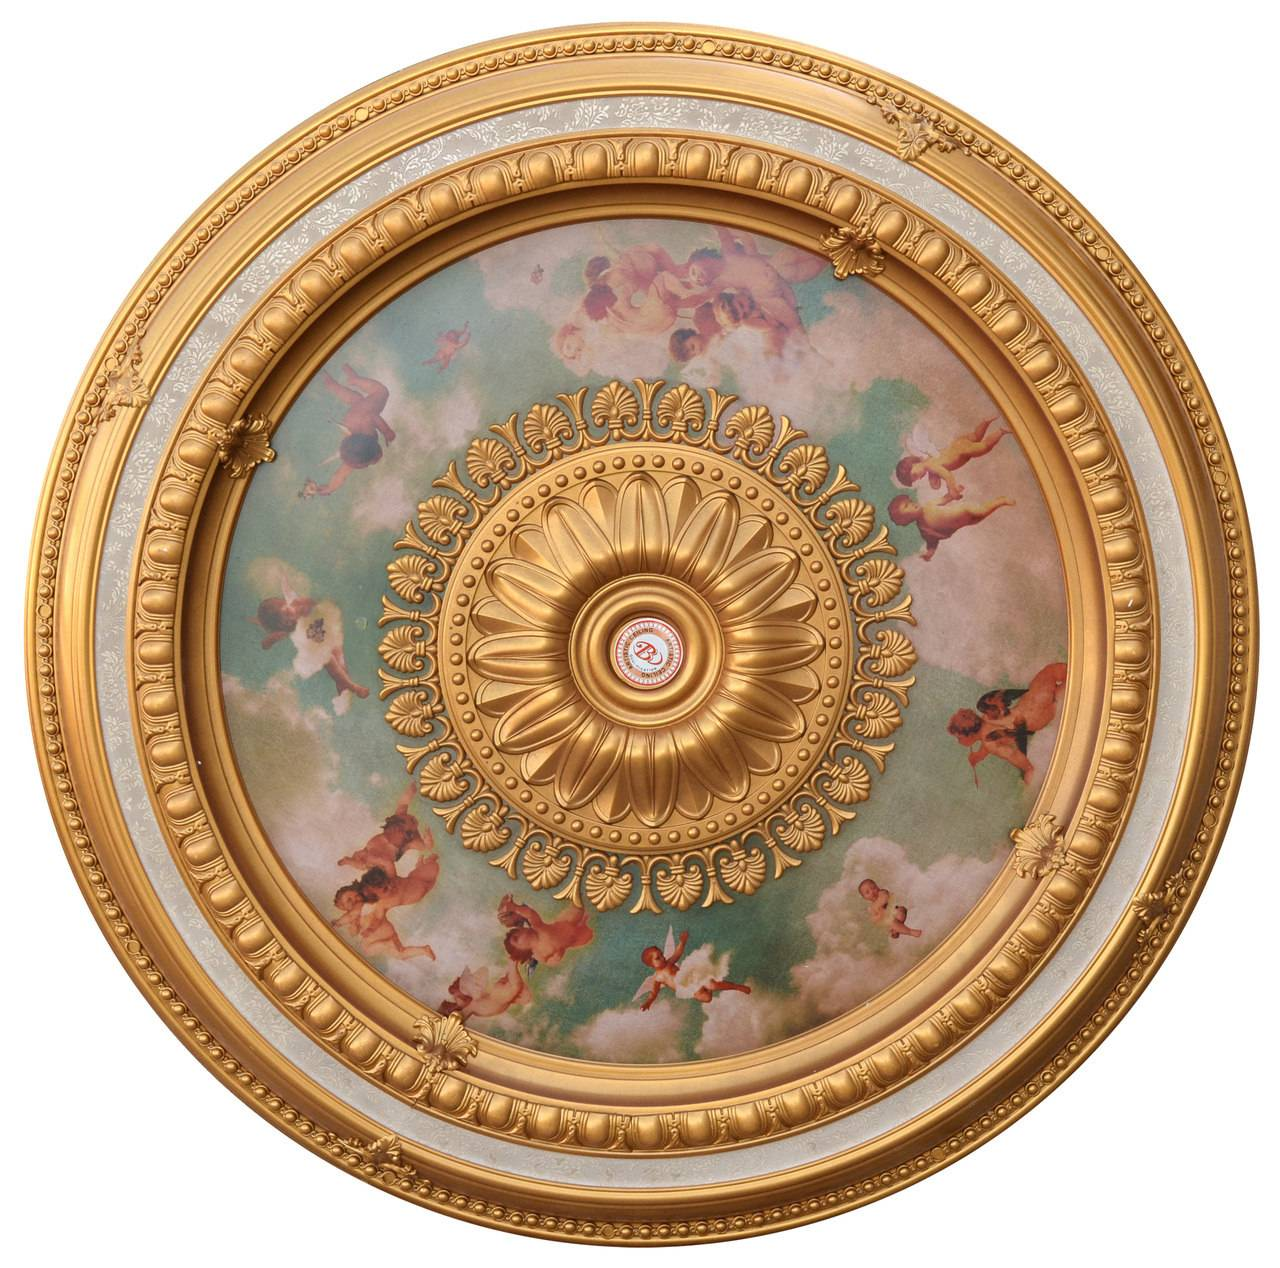 Banruo Beautiful Artistic Design Polystyrene Interior Art Deco Ceiling Medallion